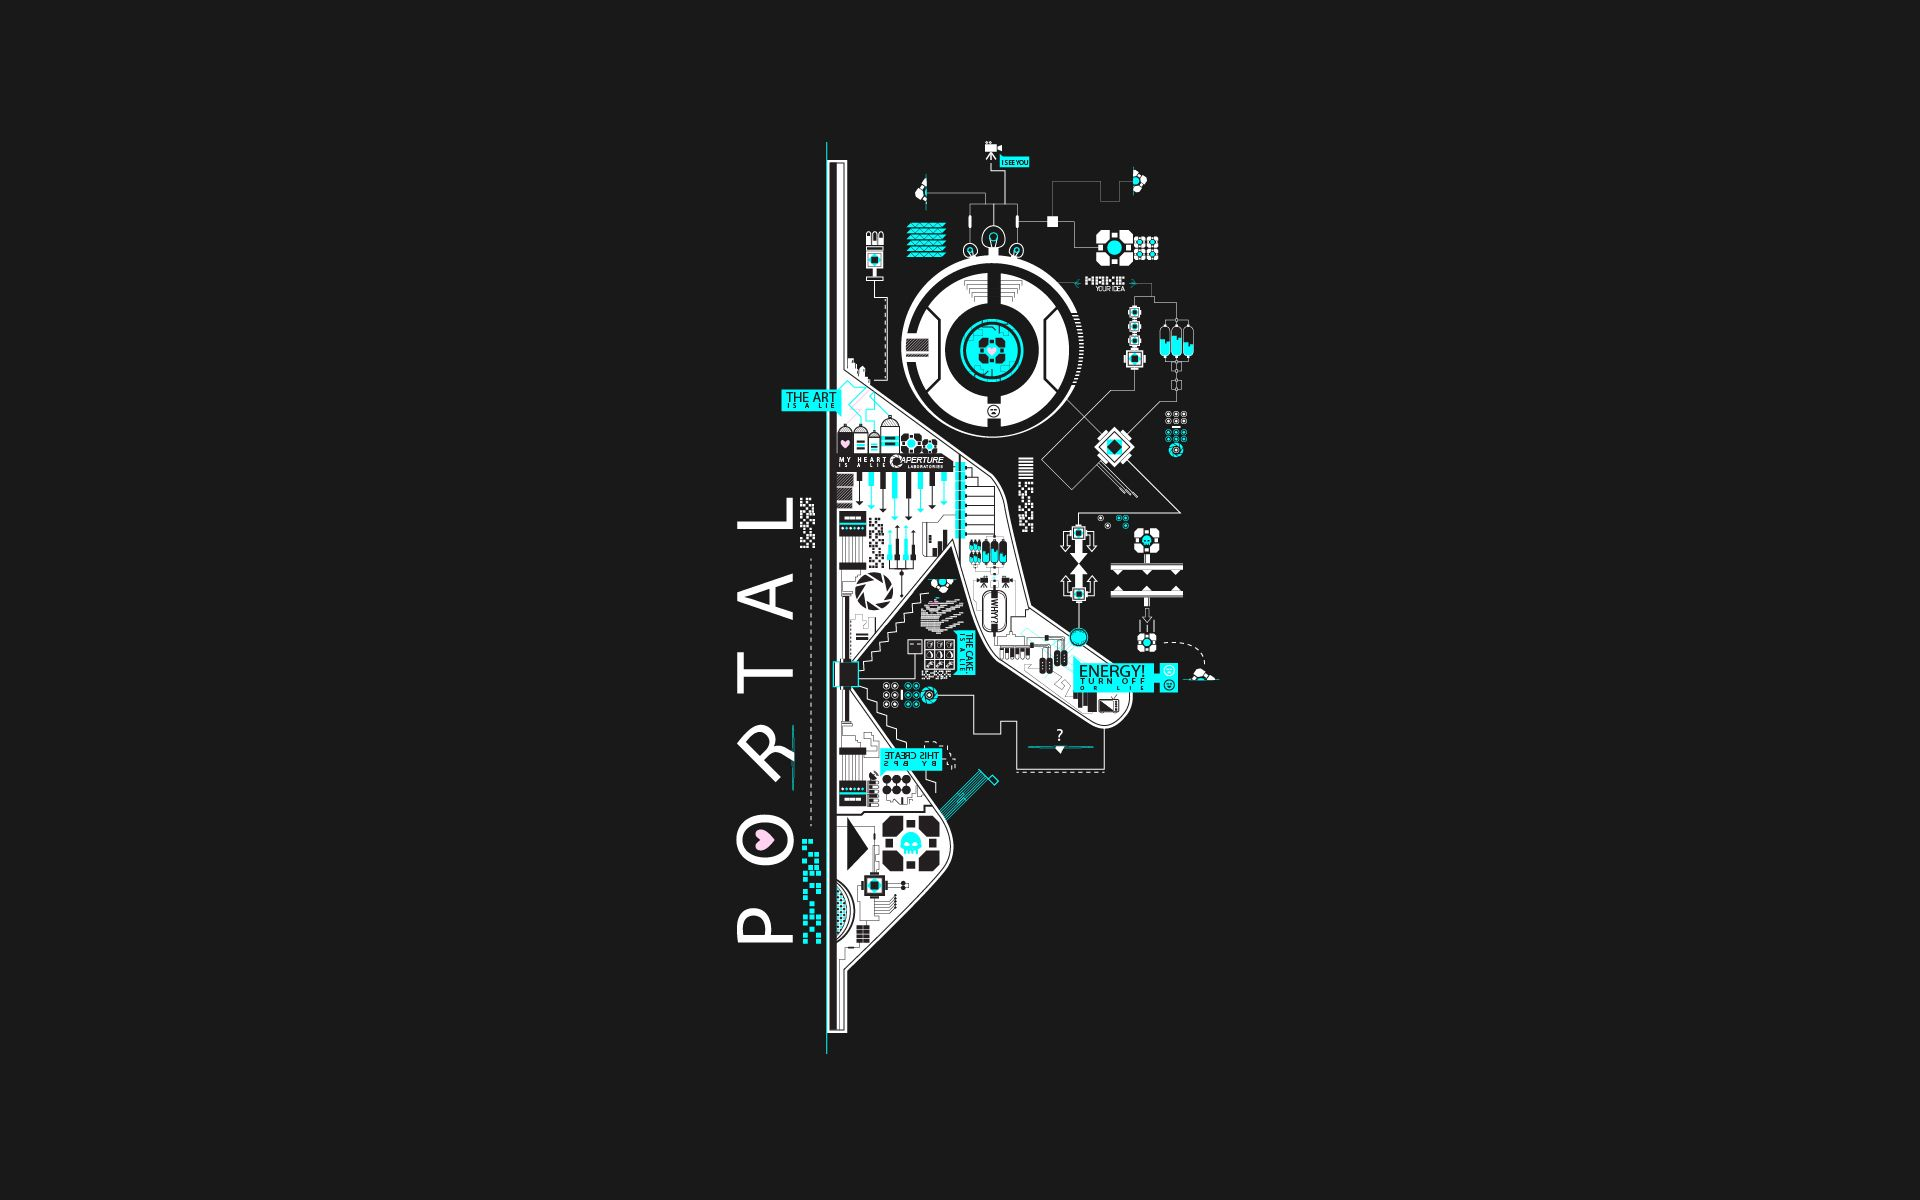 Portal 4k Wallpapers Top Free Portal 4k Backgrounds